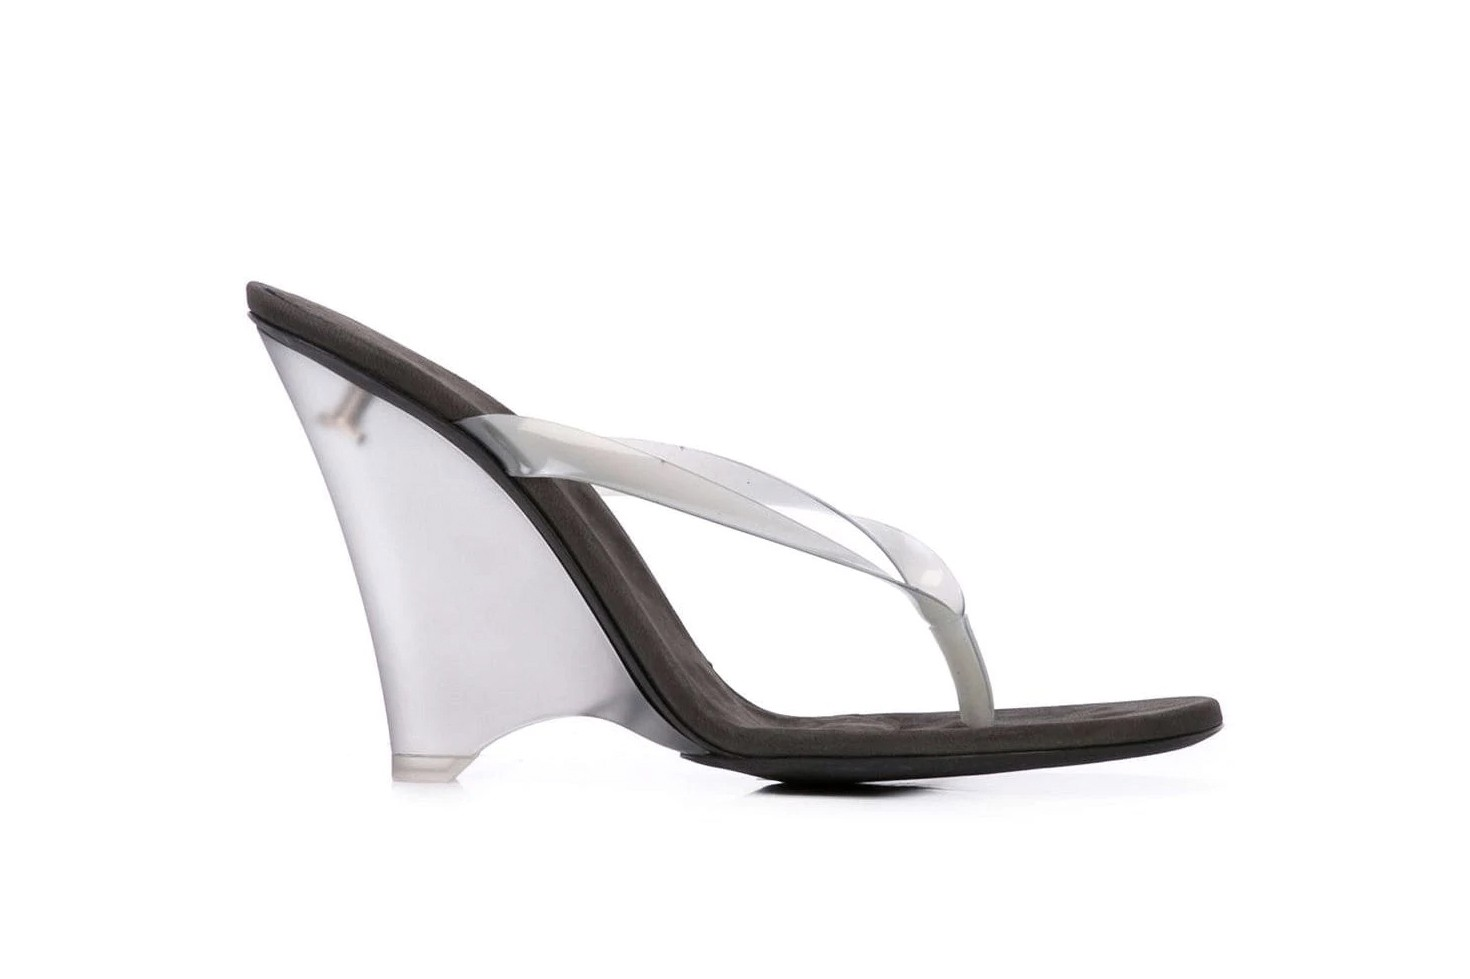 Thong Sandal Trend Bottega Veneta Balenciaga YEEZY Studio Amelia Gianvito Rossi Flip Flop